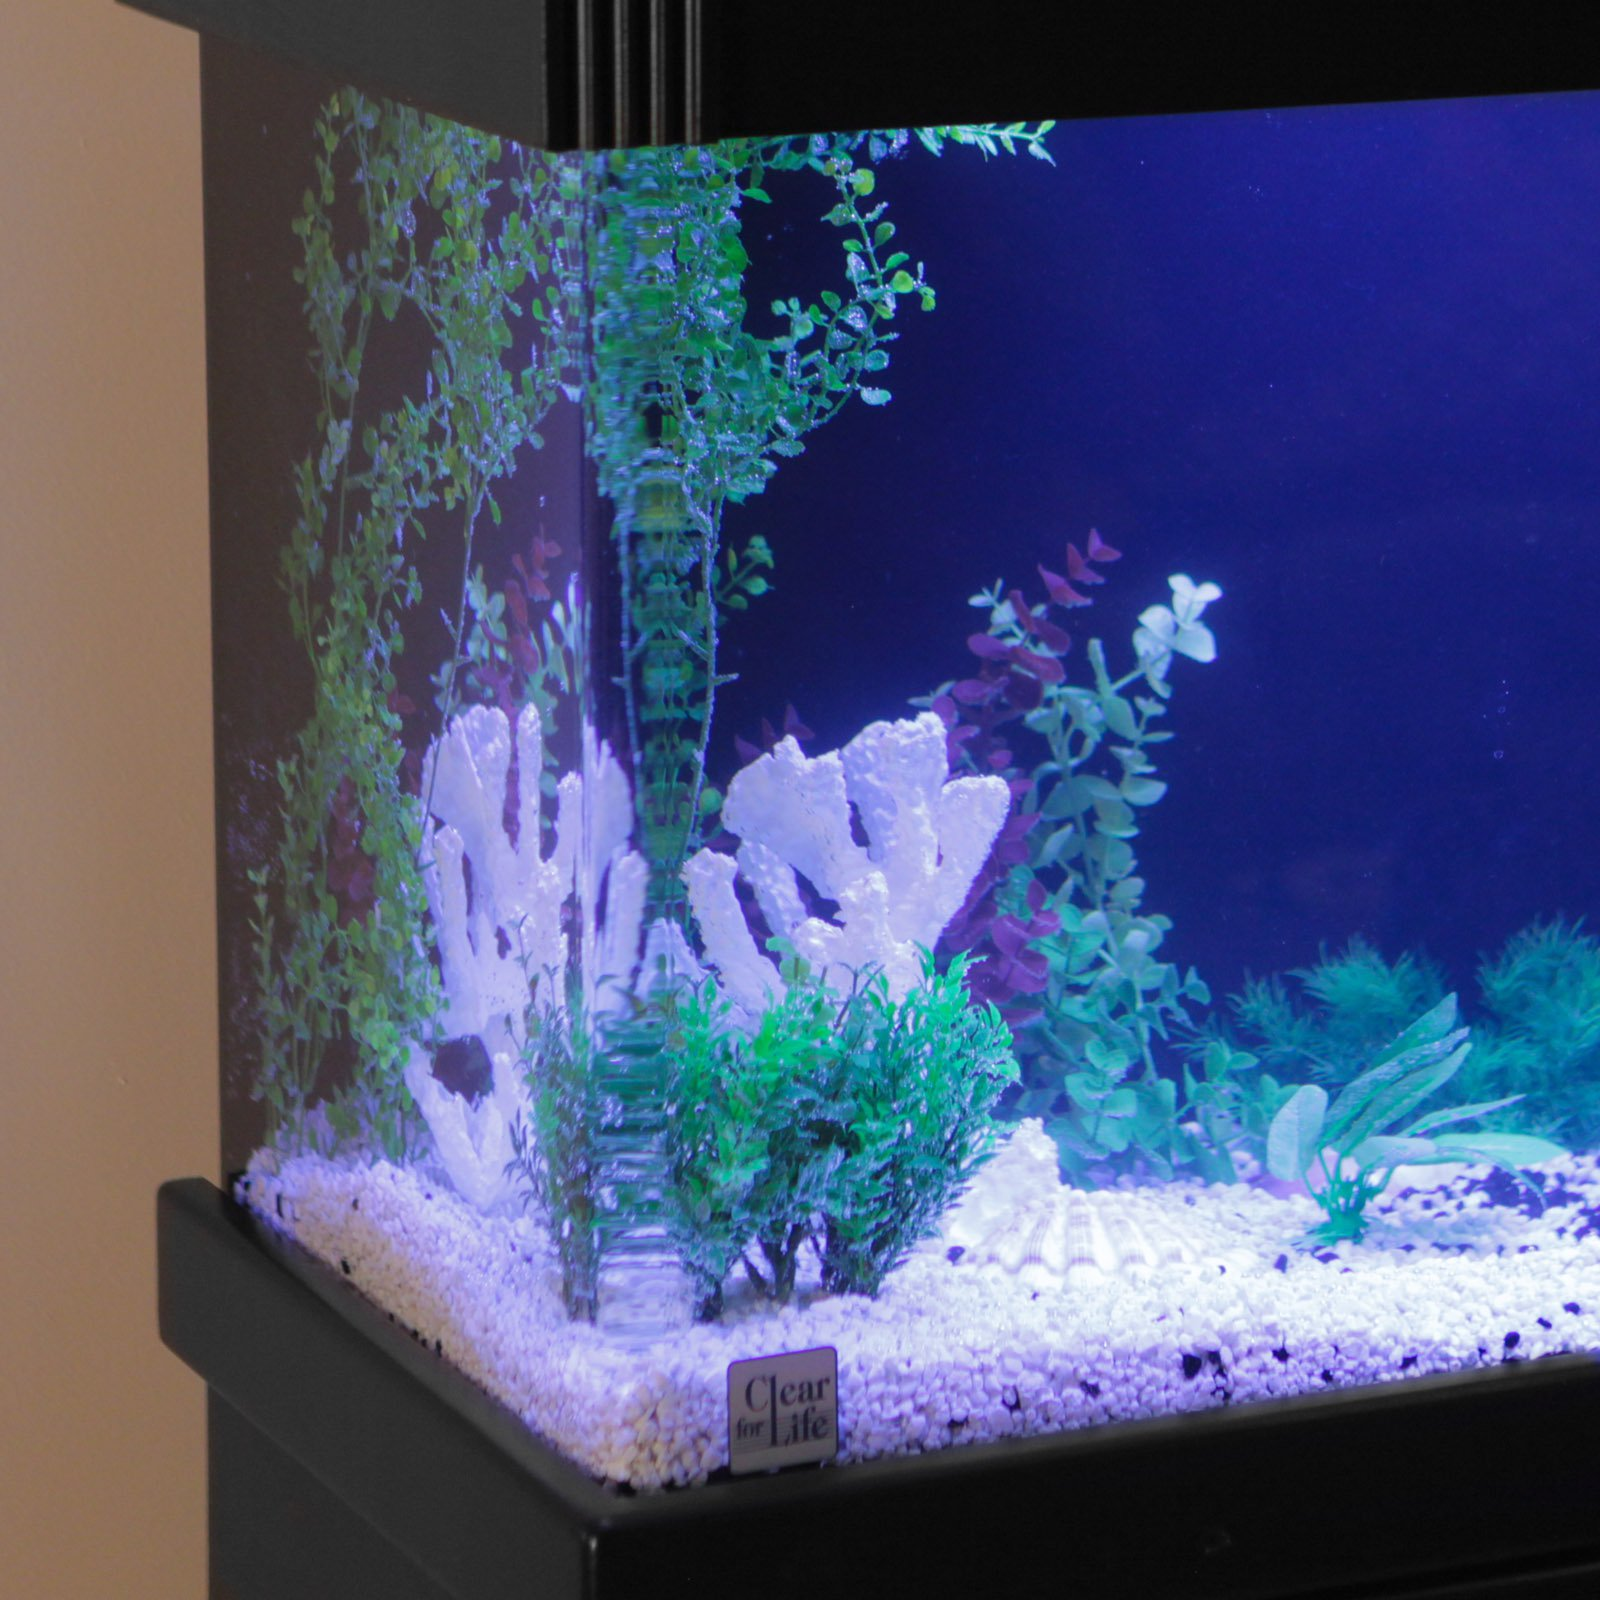 Aquarium fish tank sale uk - Aquarium Fish Tank Sale Uk